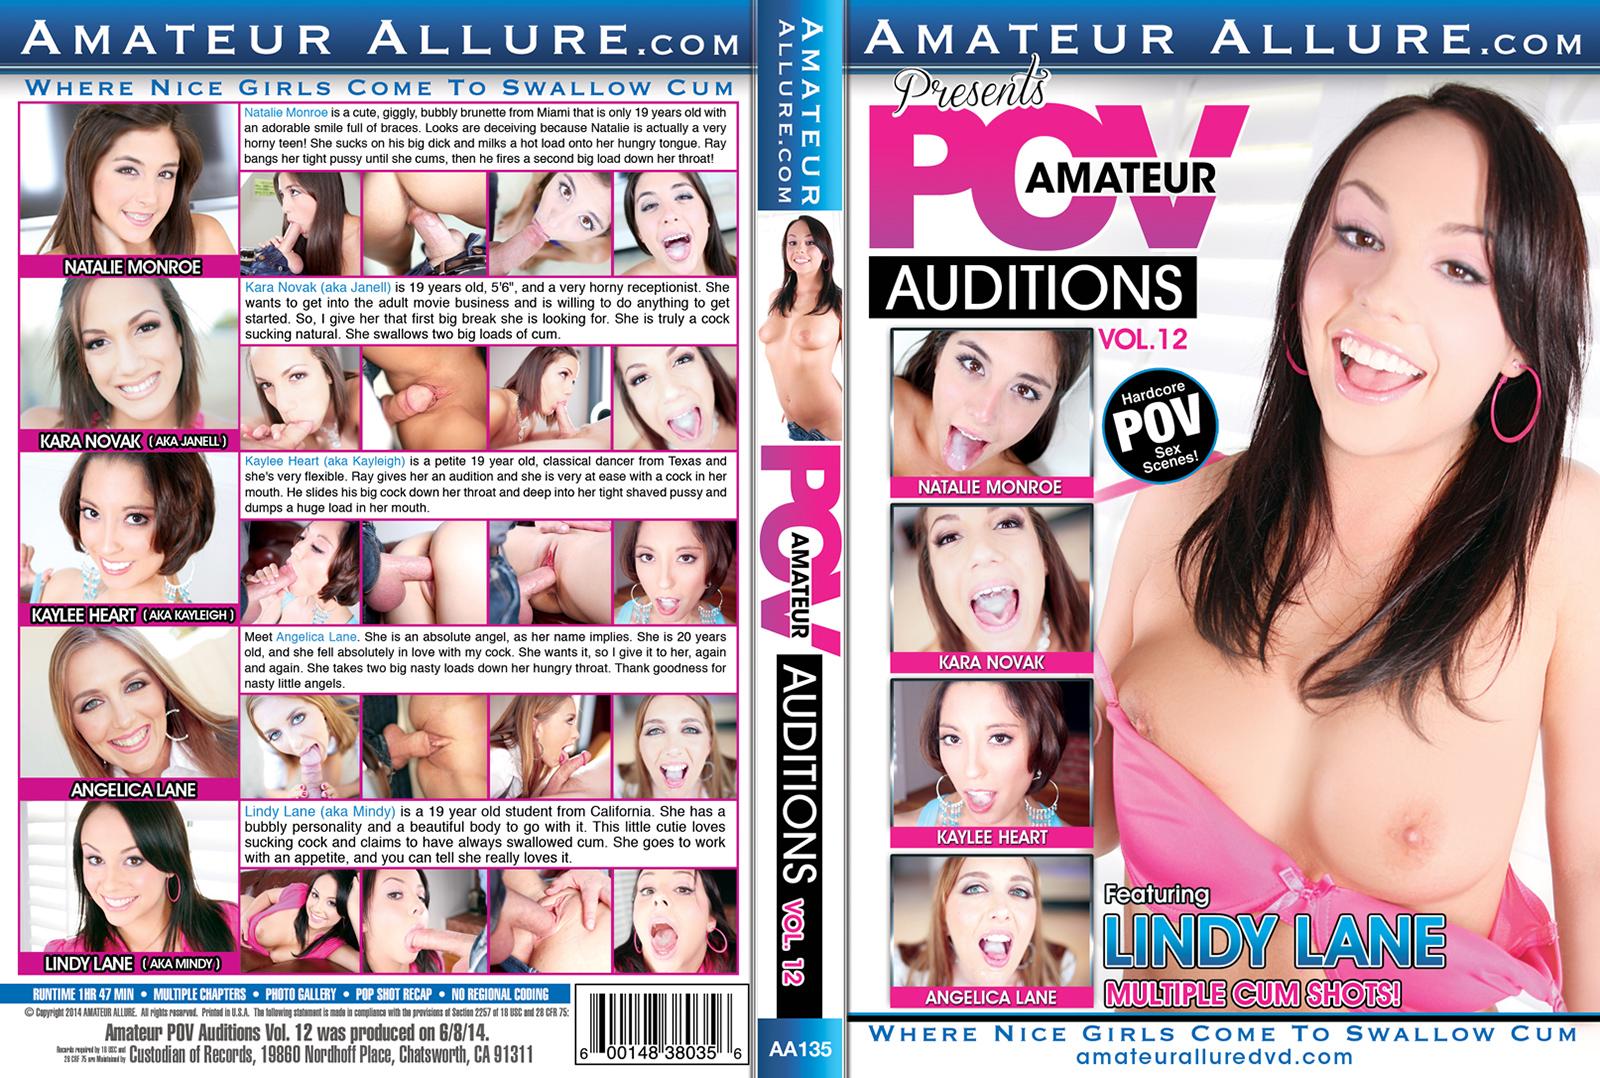 amateur_pov_auditions_12-dvd-large.jpg